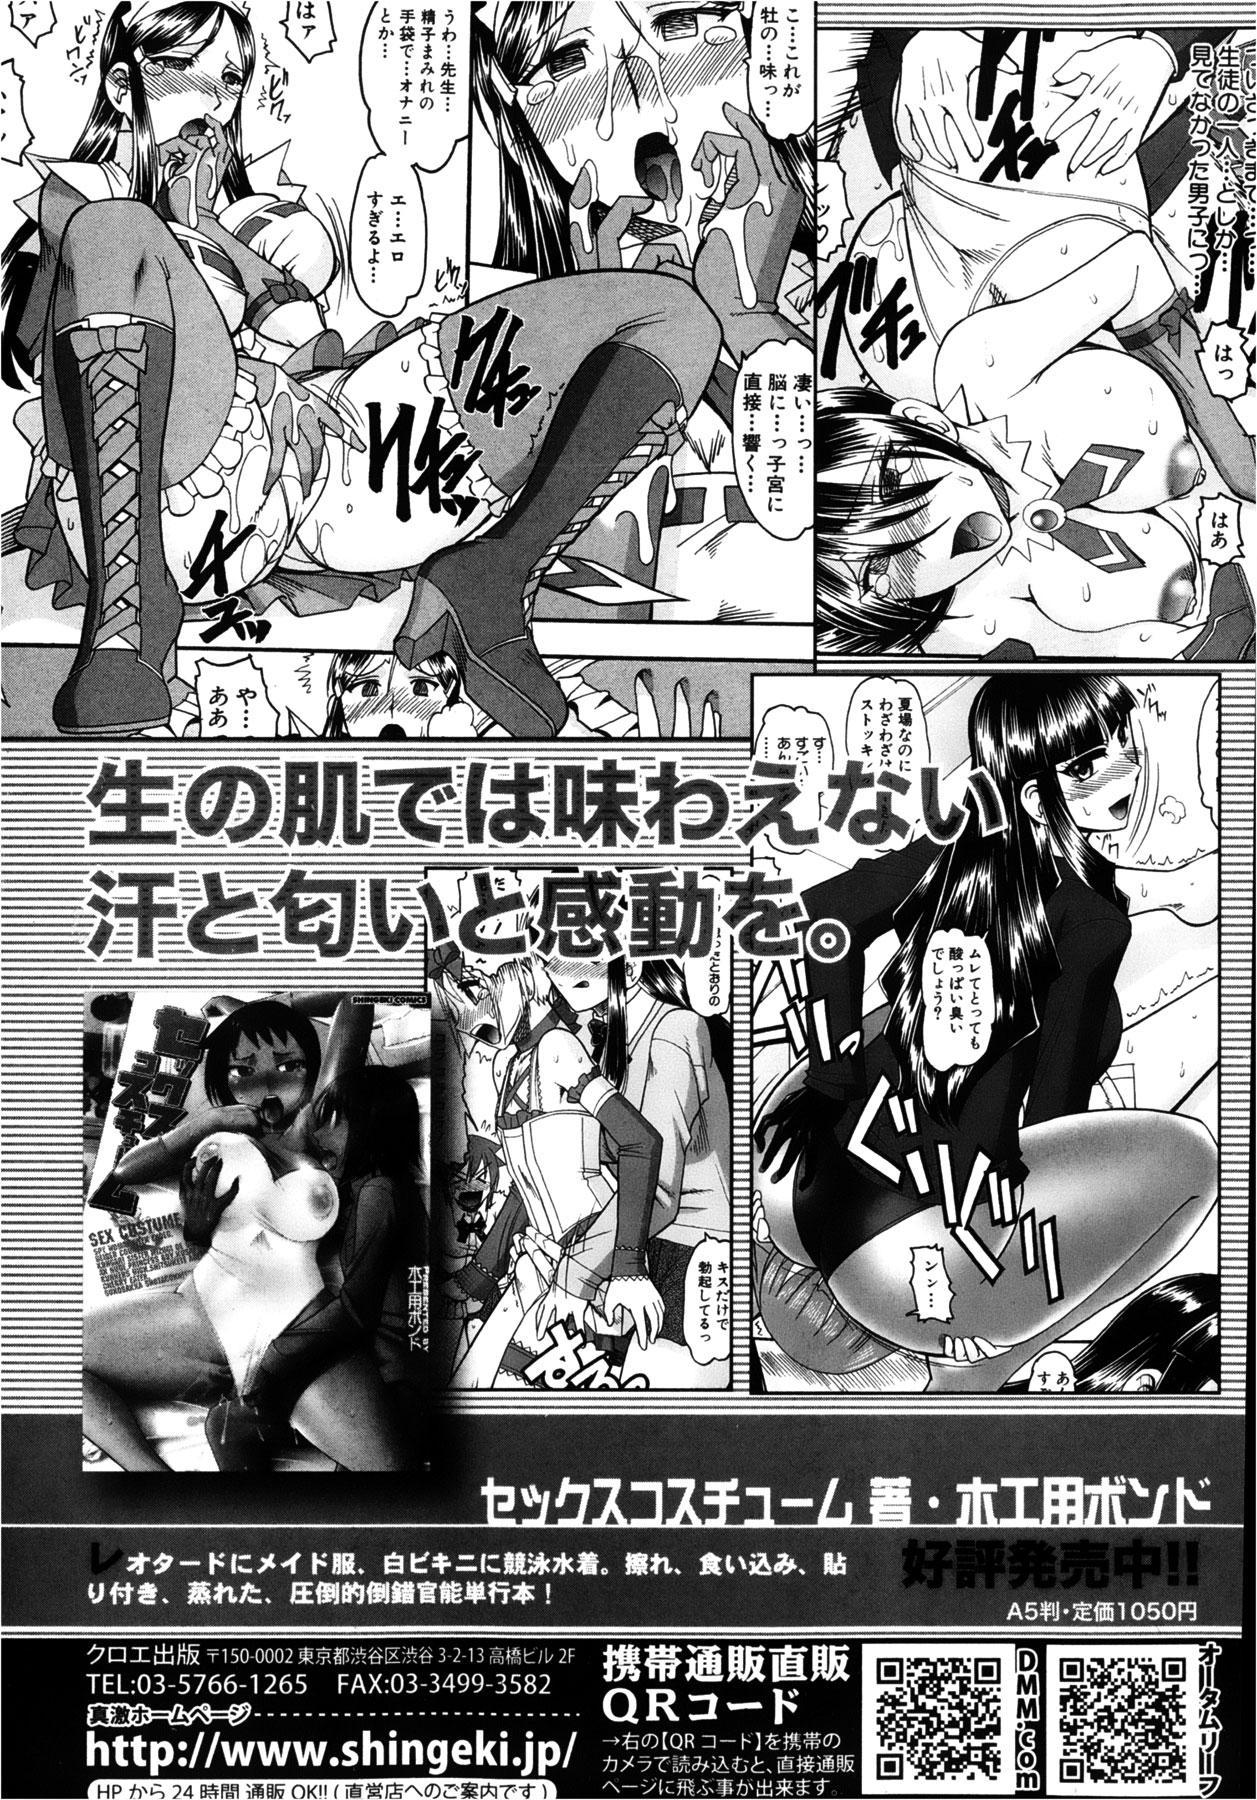 COMIC Shingeki 2013-02 164